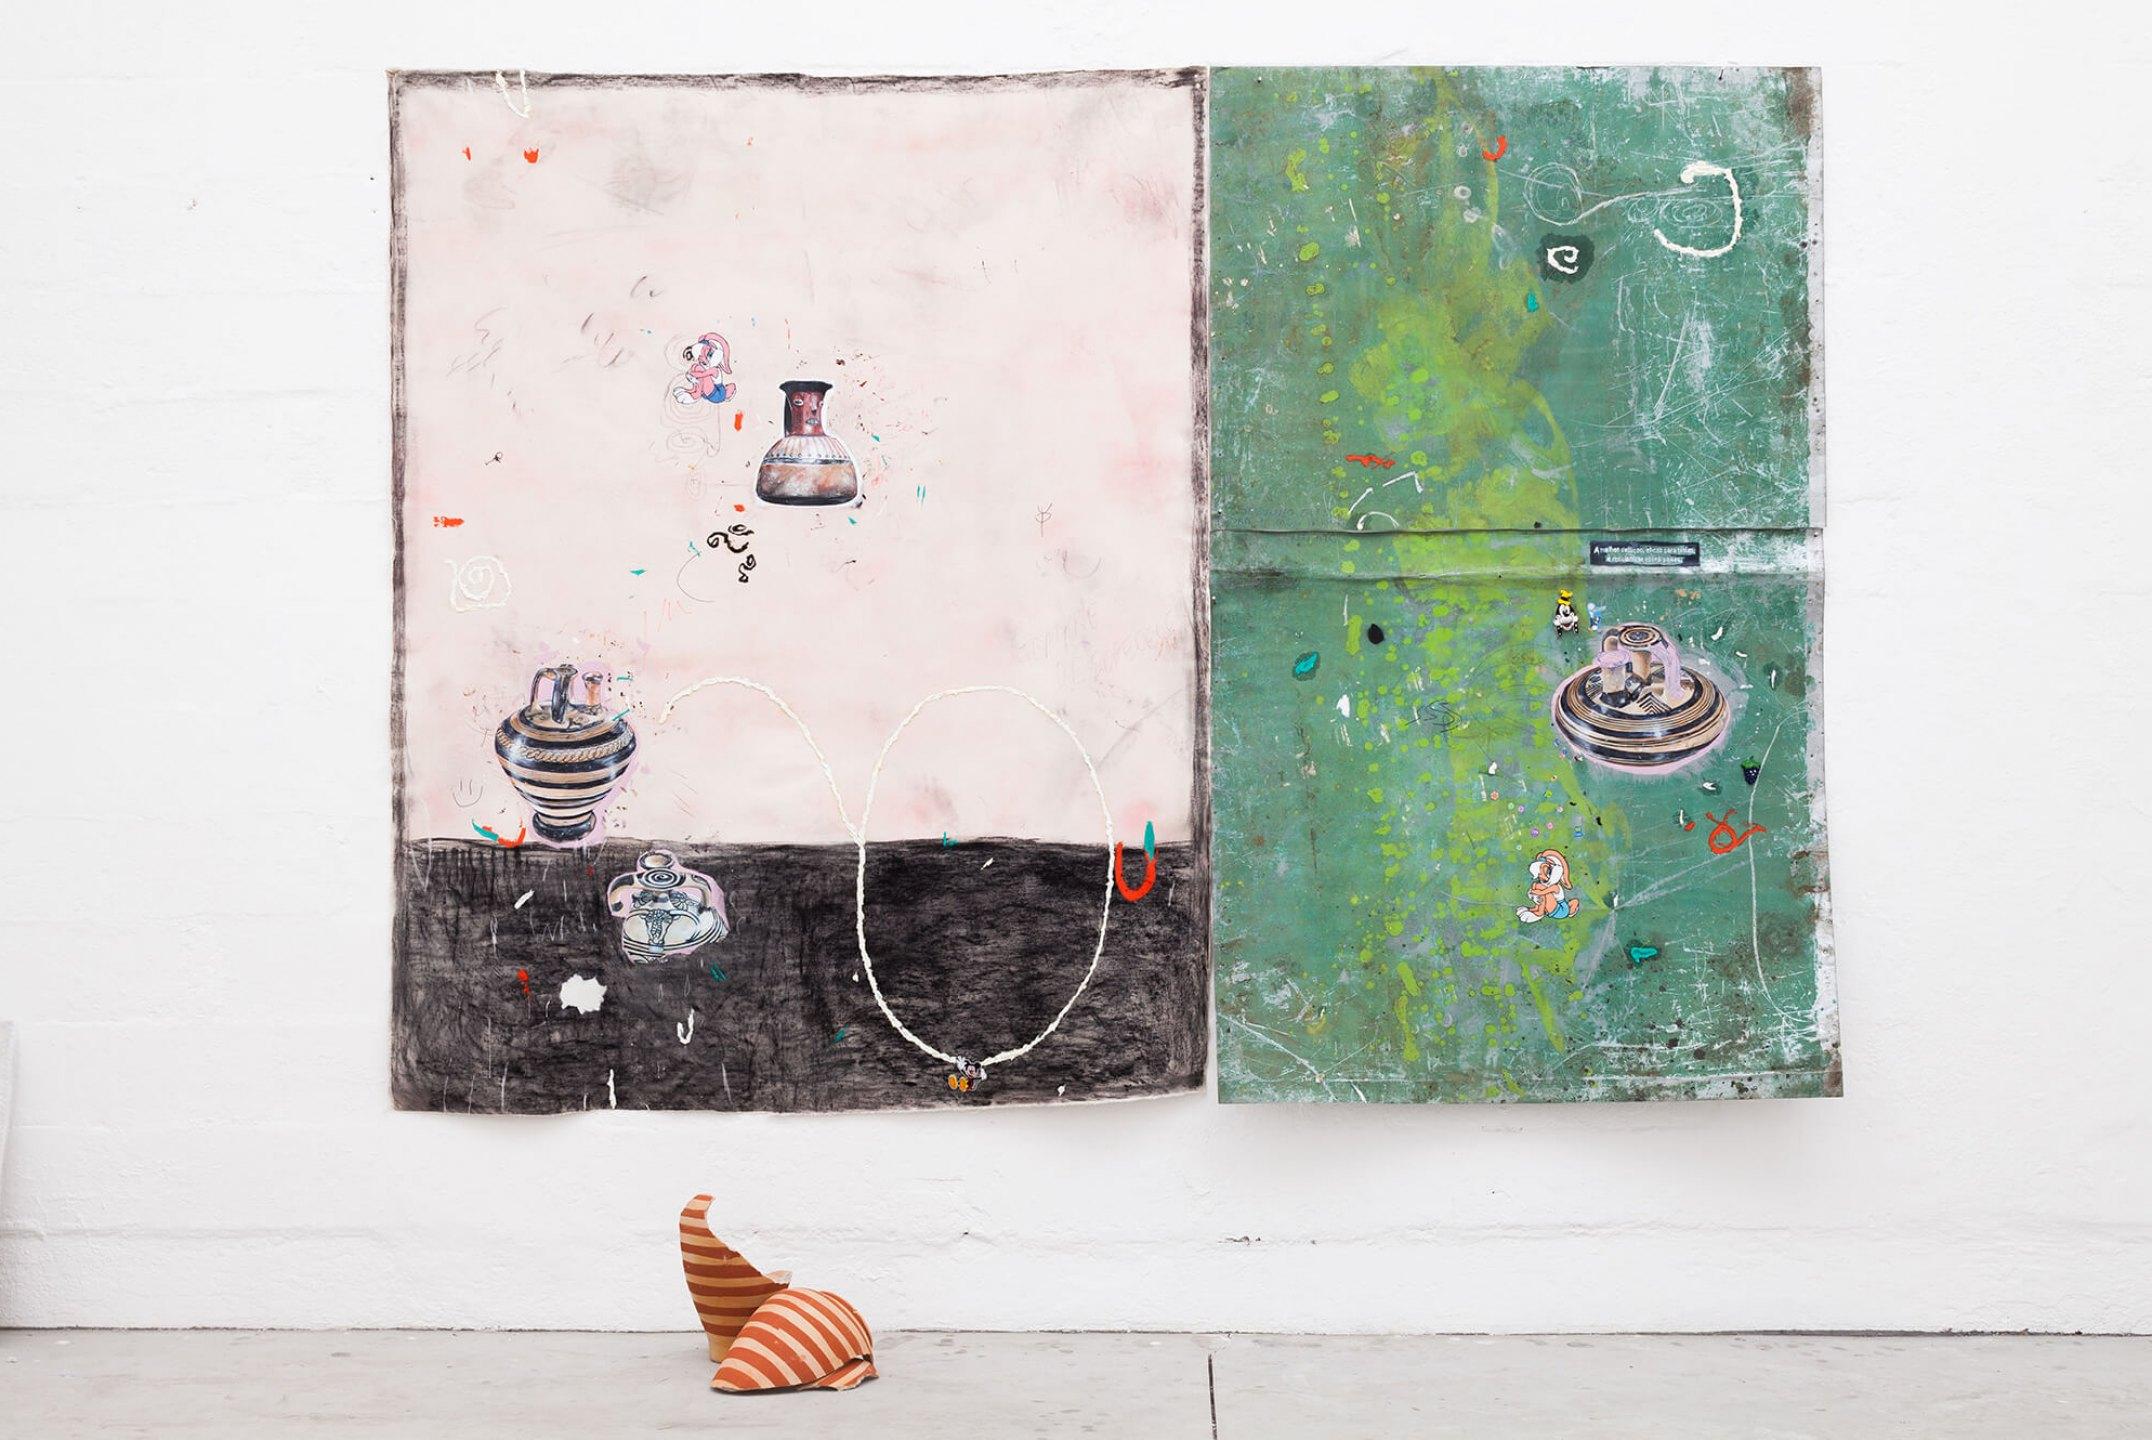 Paulo Nimer Pjota,<em>Dialogue between arrangements, constellations and time, geometric motifs and ancient empires #3,</em>2015, mixed media on canvas and aluminum, ceramic, 200×276 cm - Mendes Wood DM